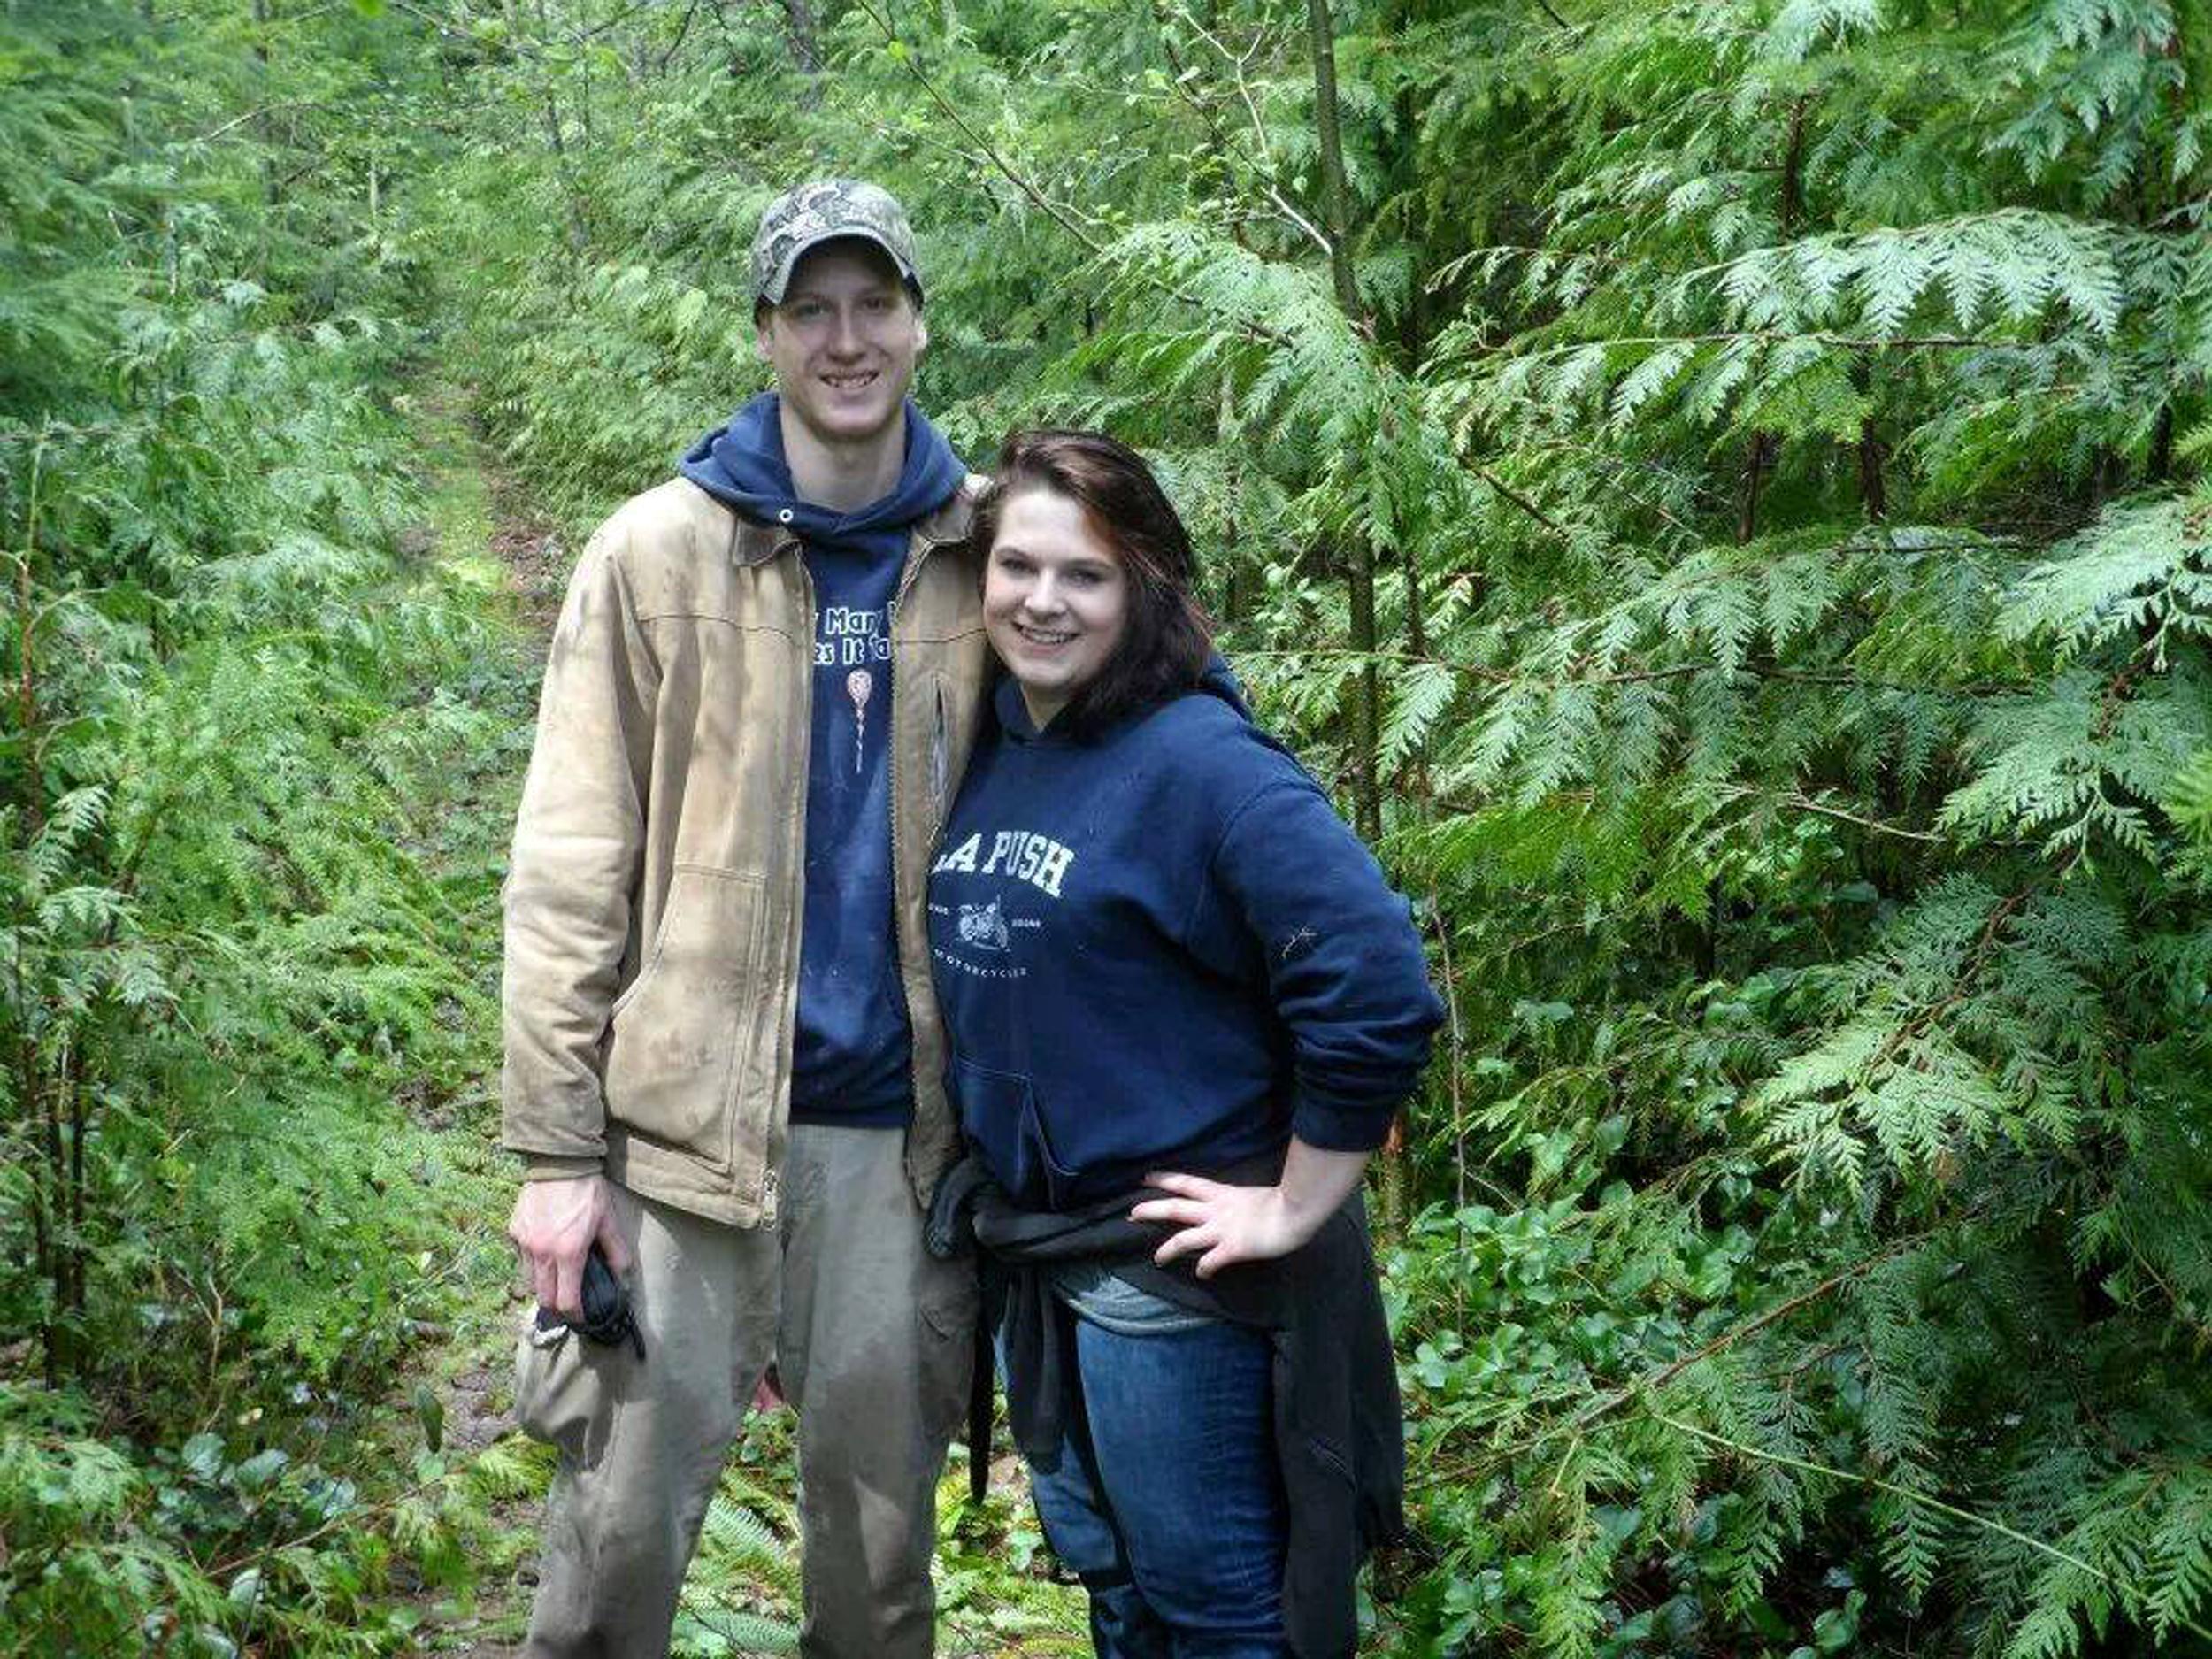 Image: Alan Bejvl and his fiancee Delaney Webb